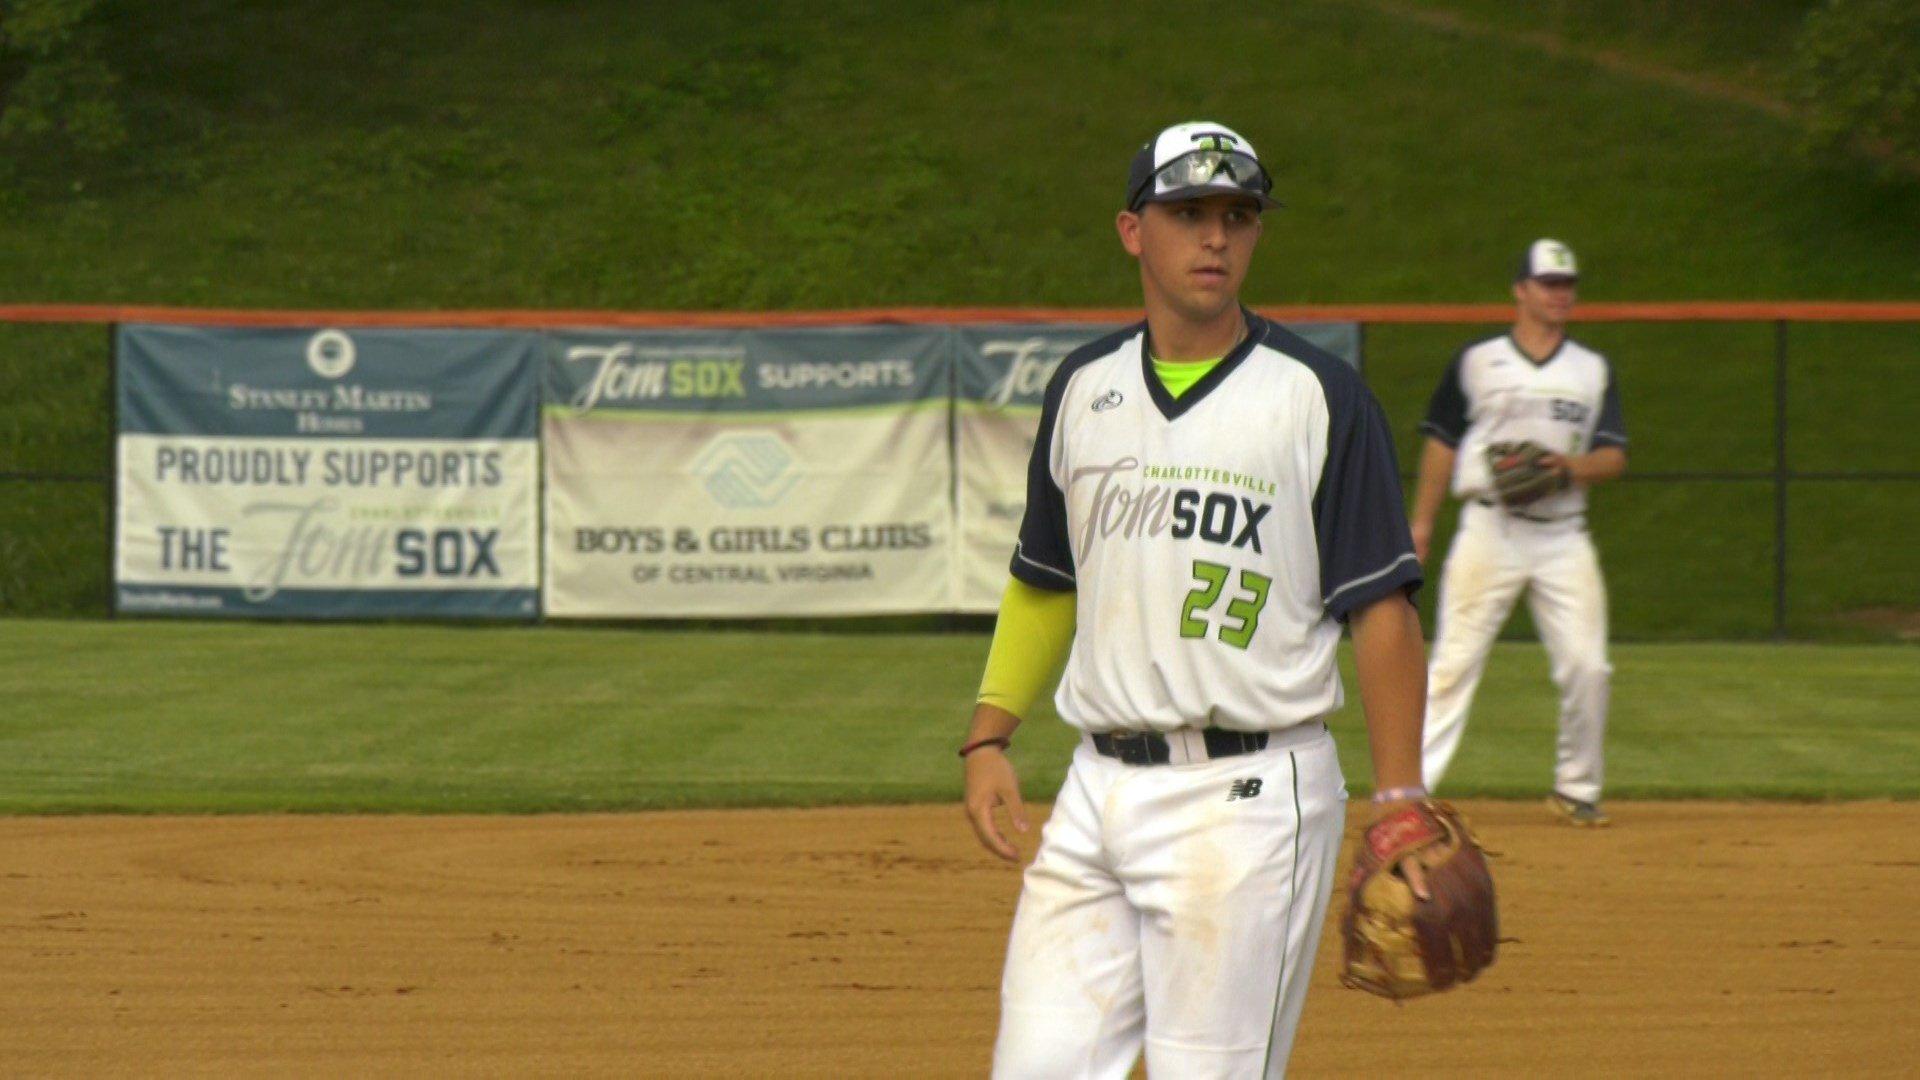 Tom Sox Win Playoff Series, Beat Covington 10-5